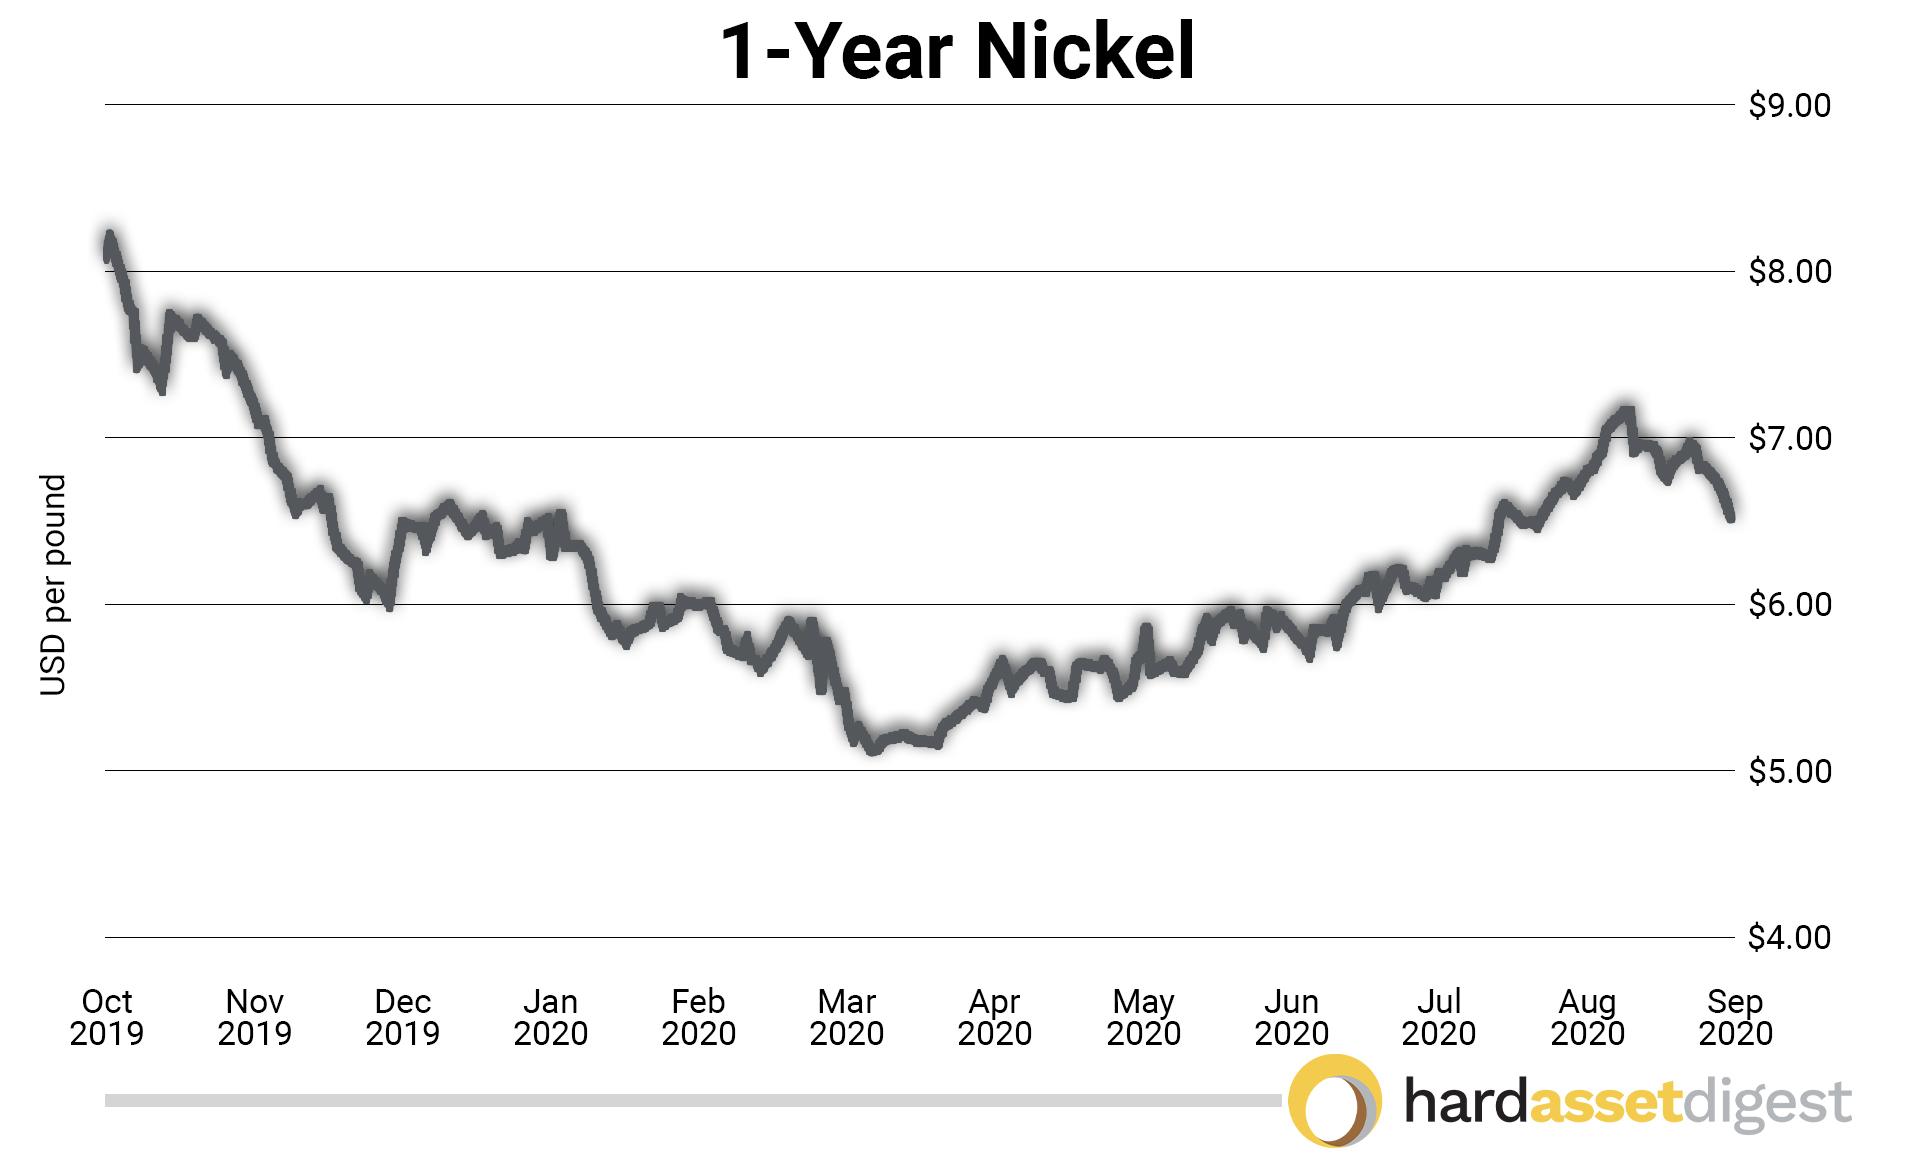 1year-nickel-usd-per-pound